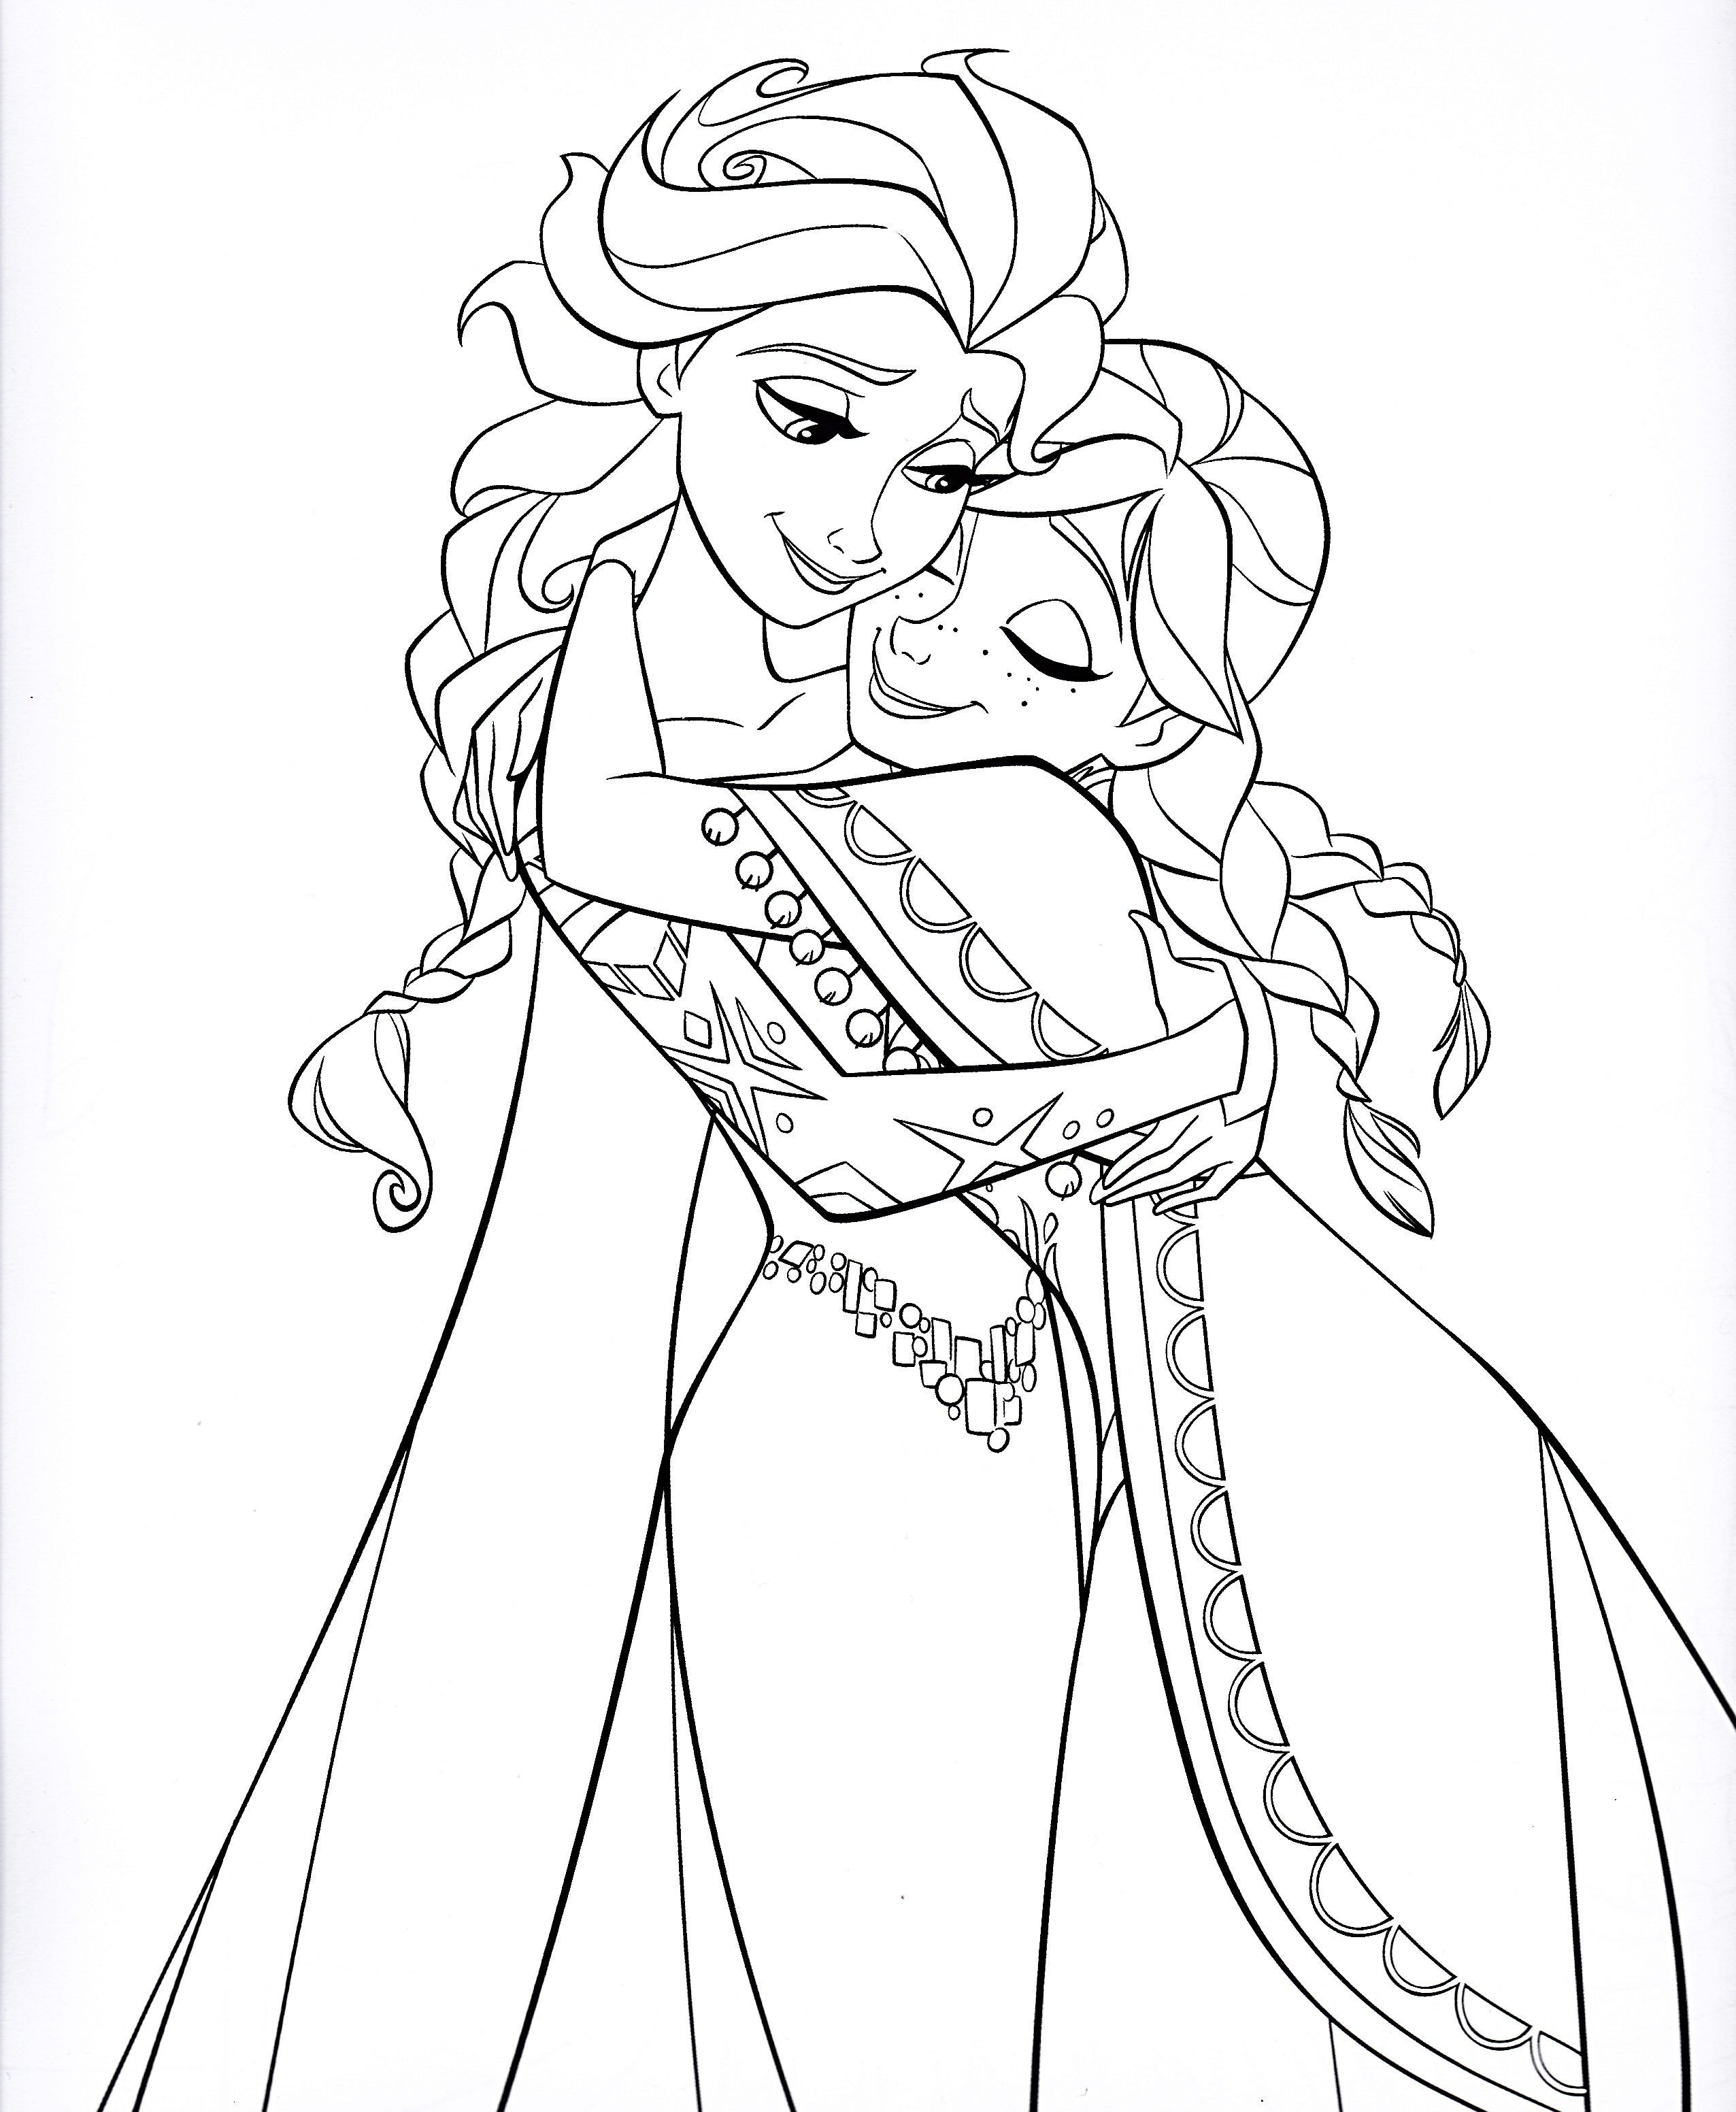 Disney Princess Coloring Pages Frozen Anna Through the